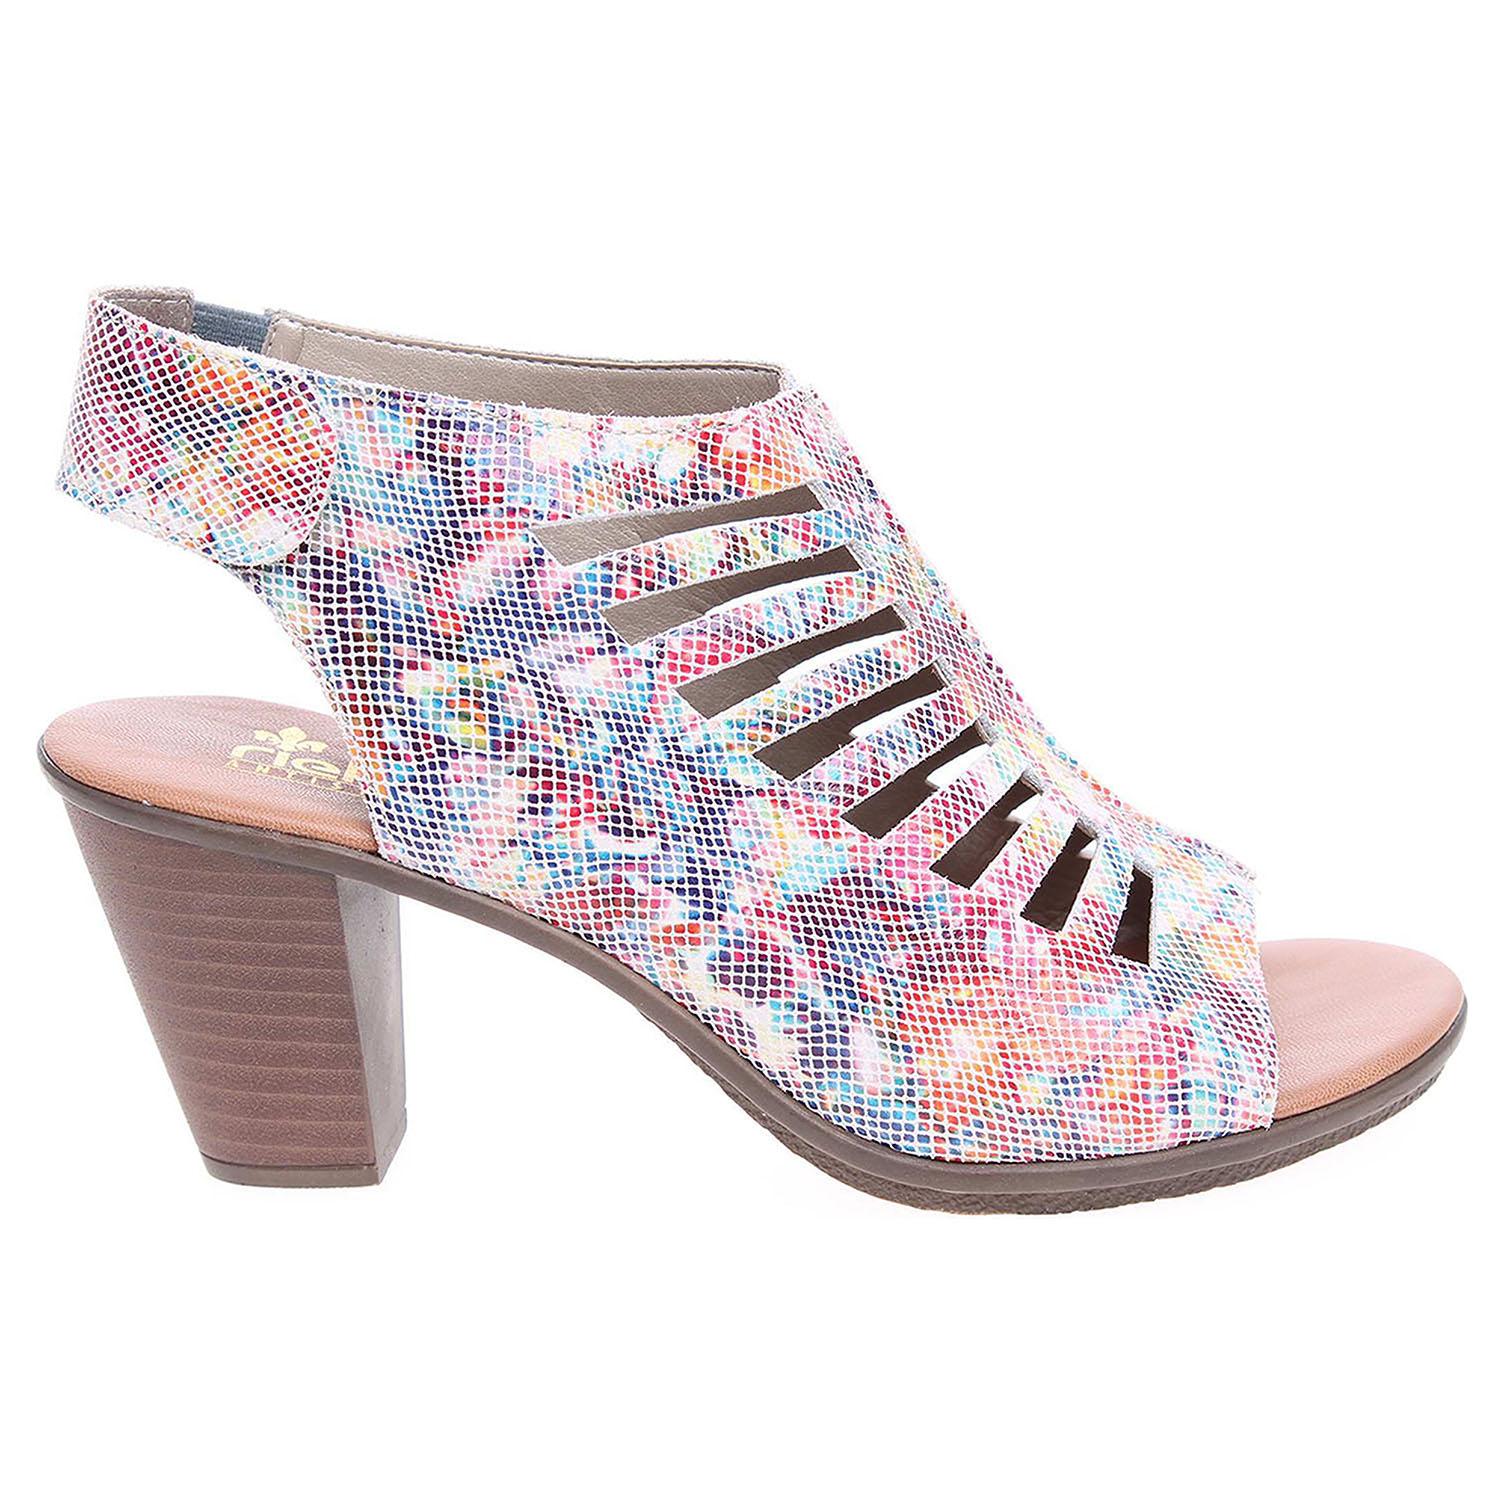 Ecco Rieker dámské sandály 64195-90 multi 23801115